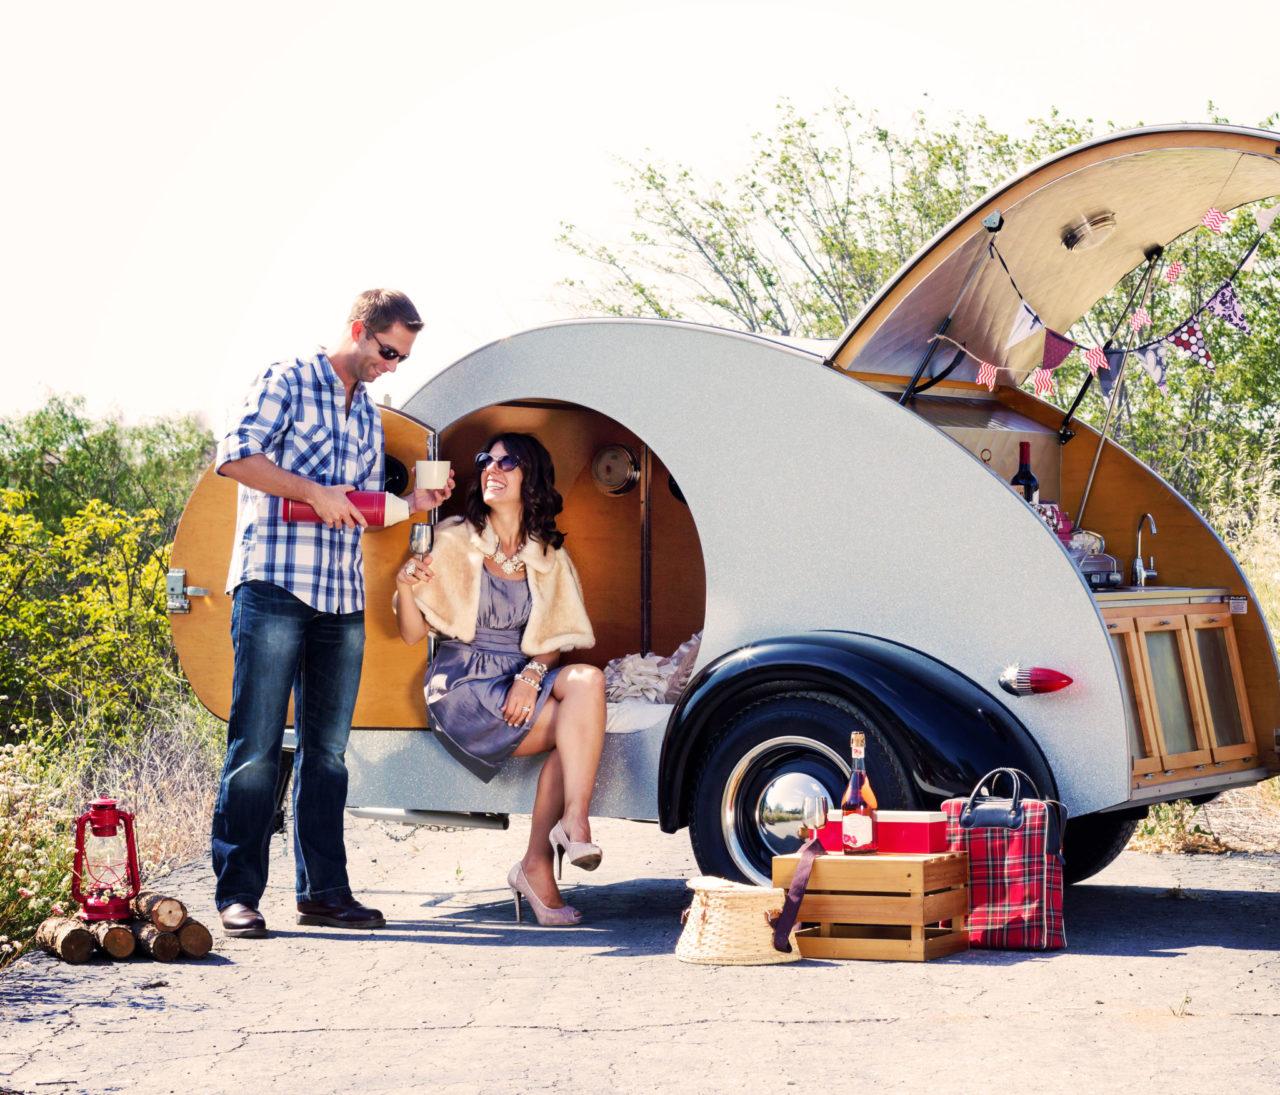 Man and woman glamorously camping